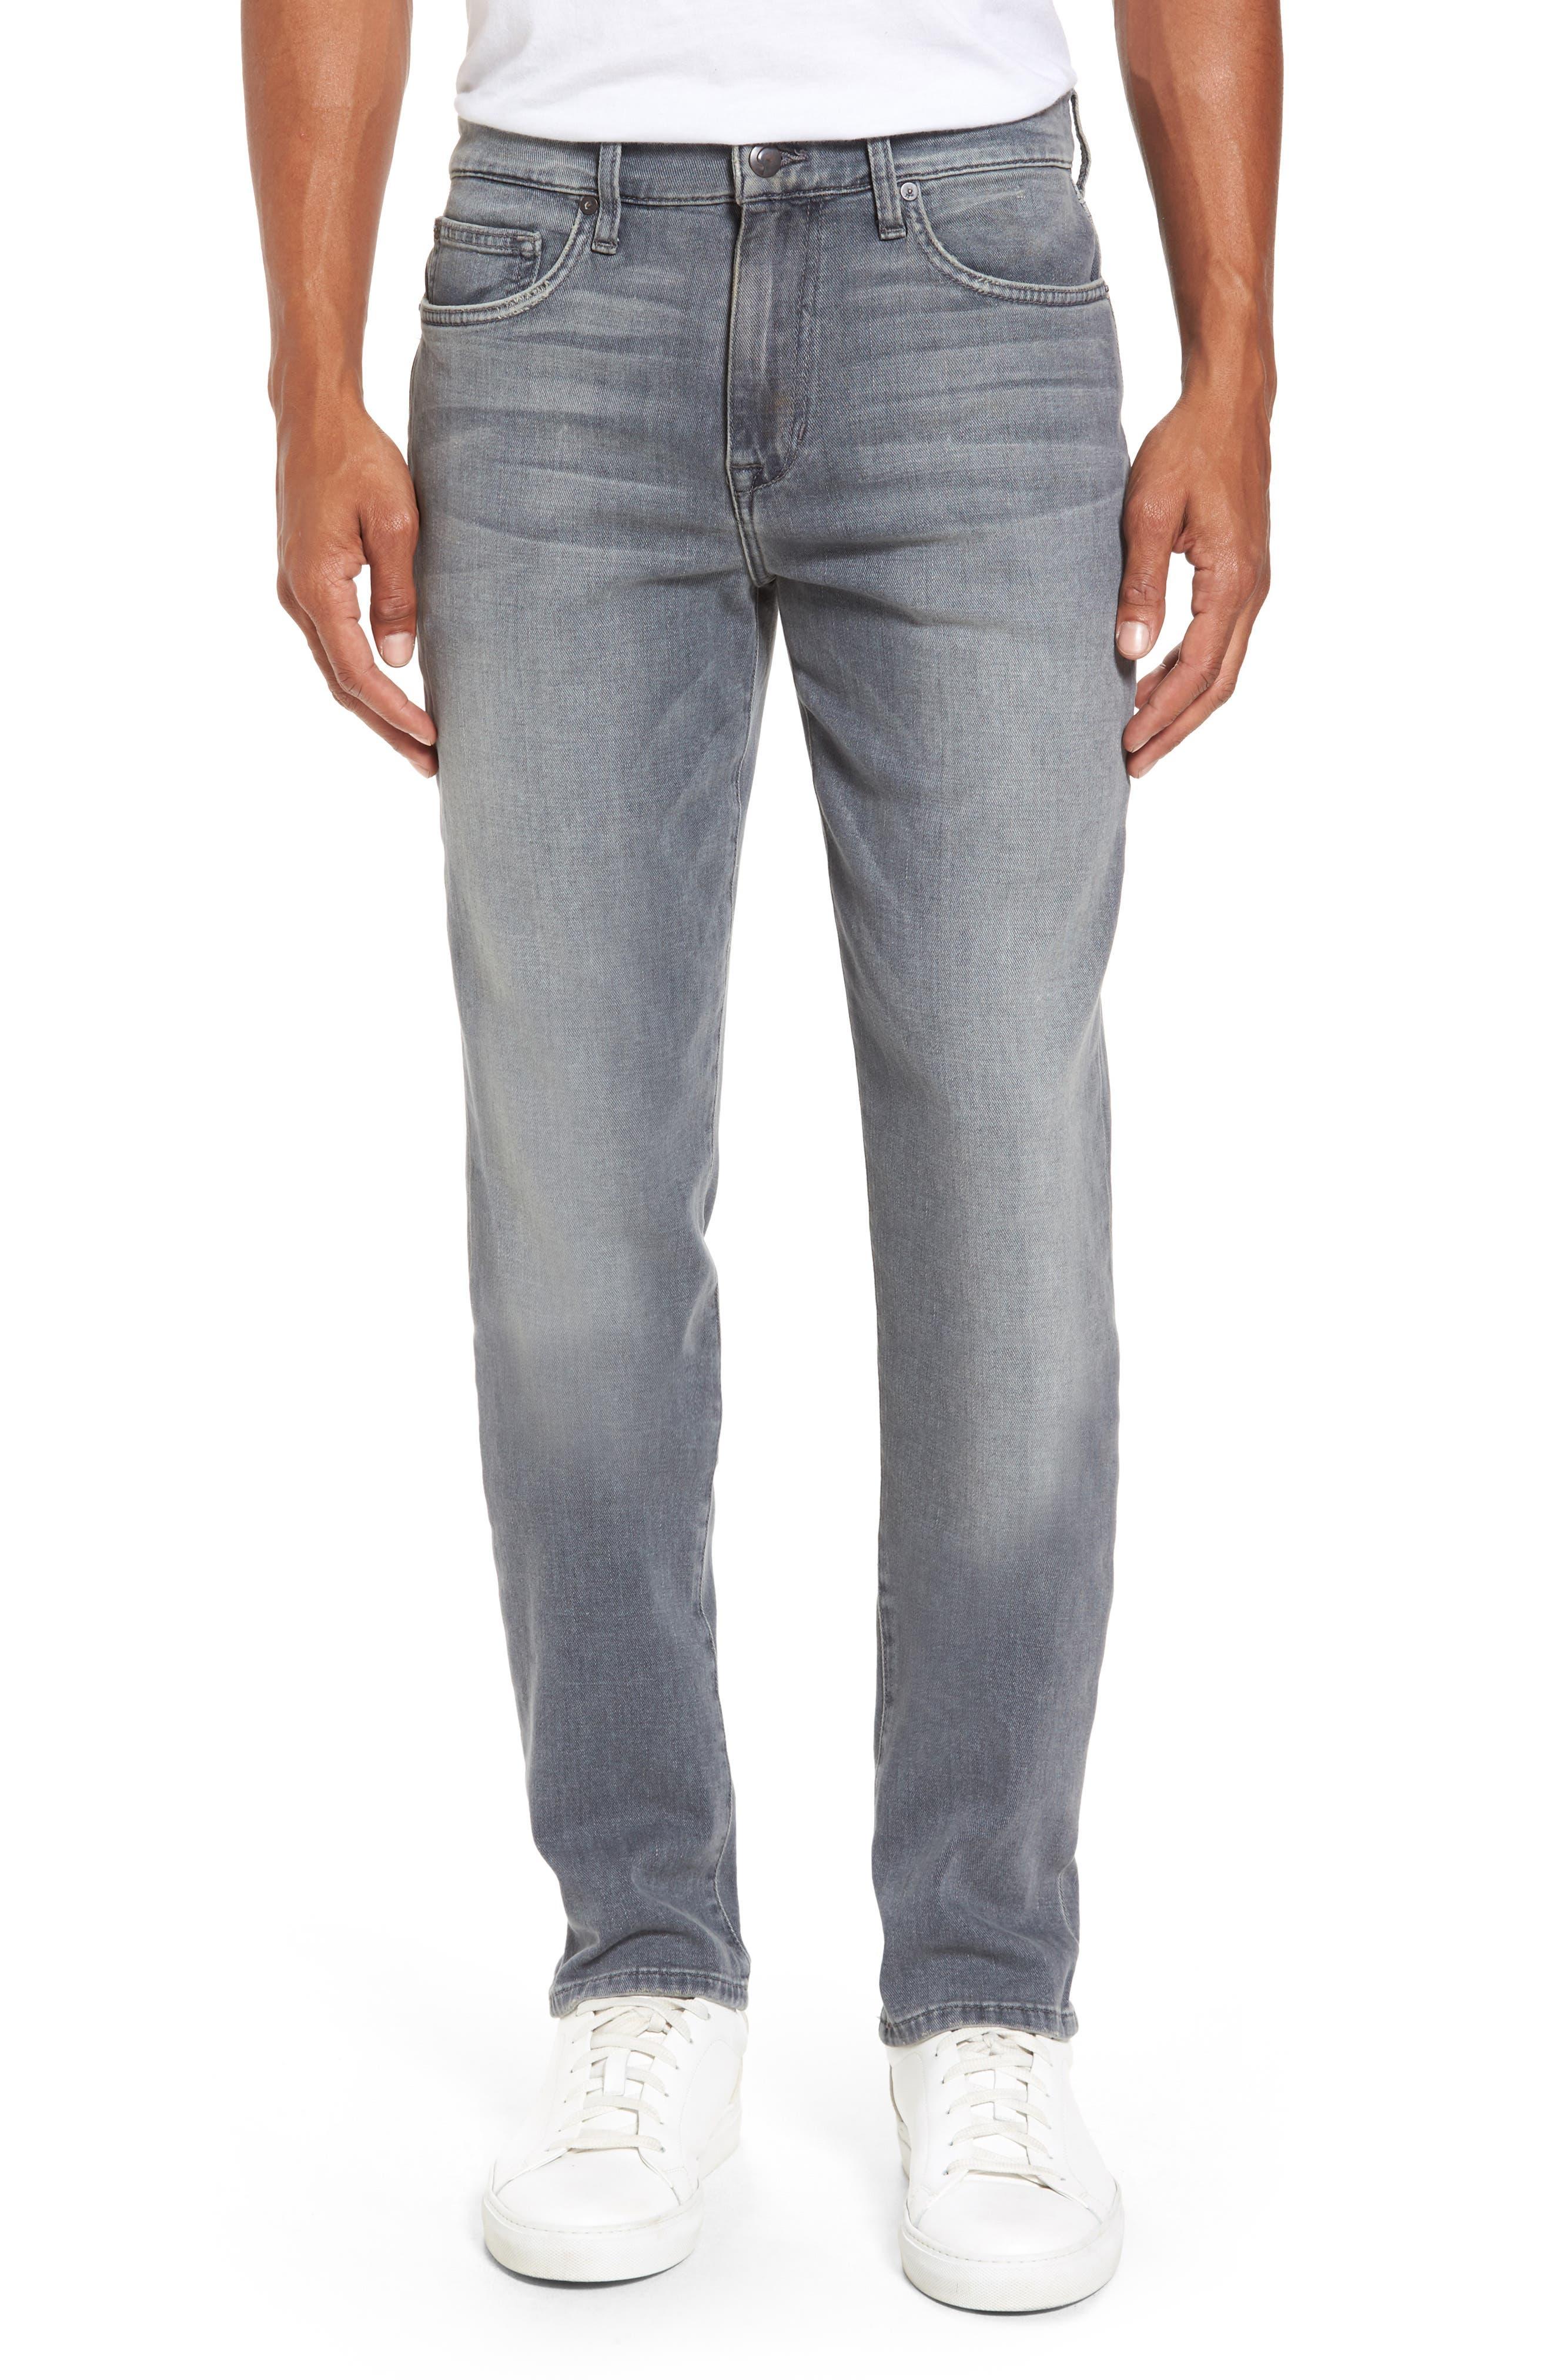 Alternate Image 1 Selected - Joe's Slim Fit Jeans (Donner)